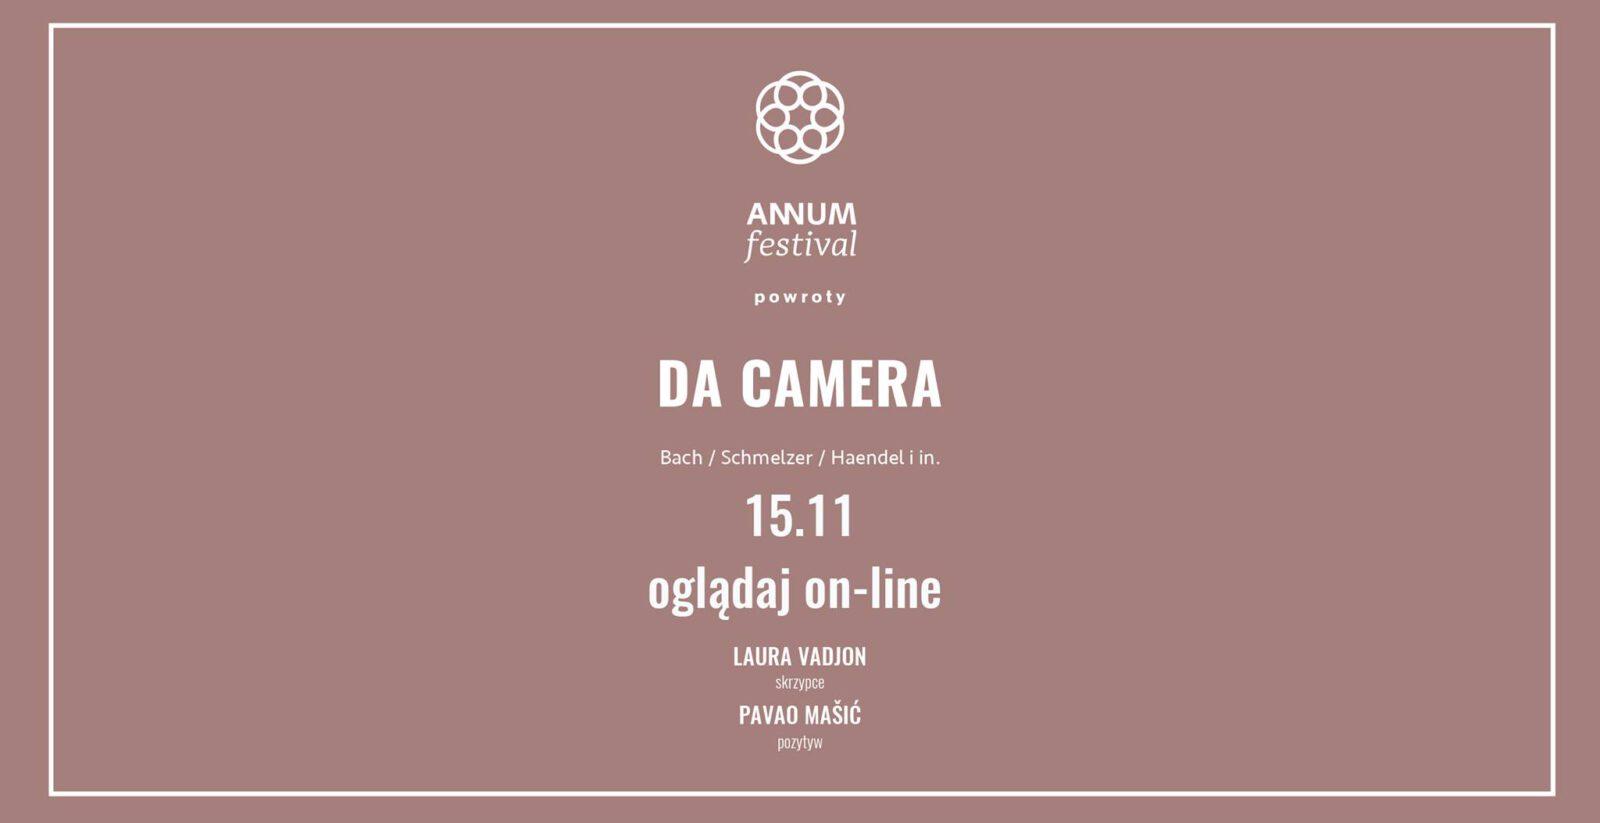 Annum Festival - Da Camera 15.11.2020 - zaproszenie do oglądania online - - infografika